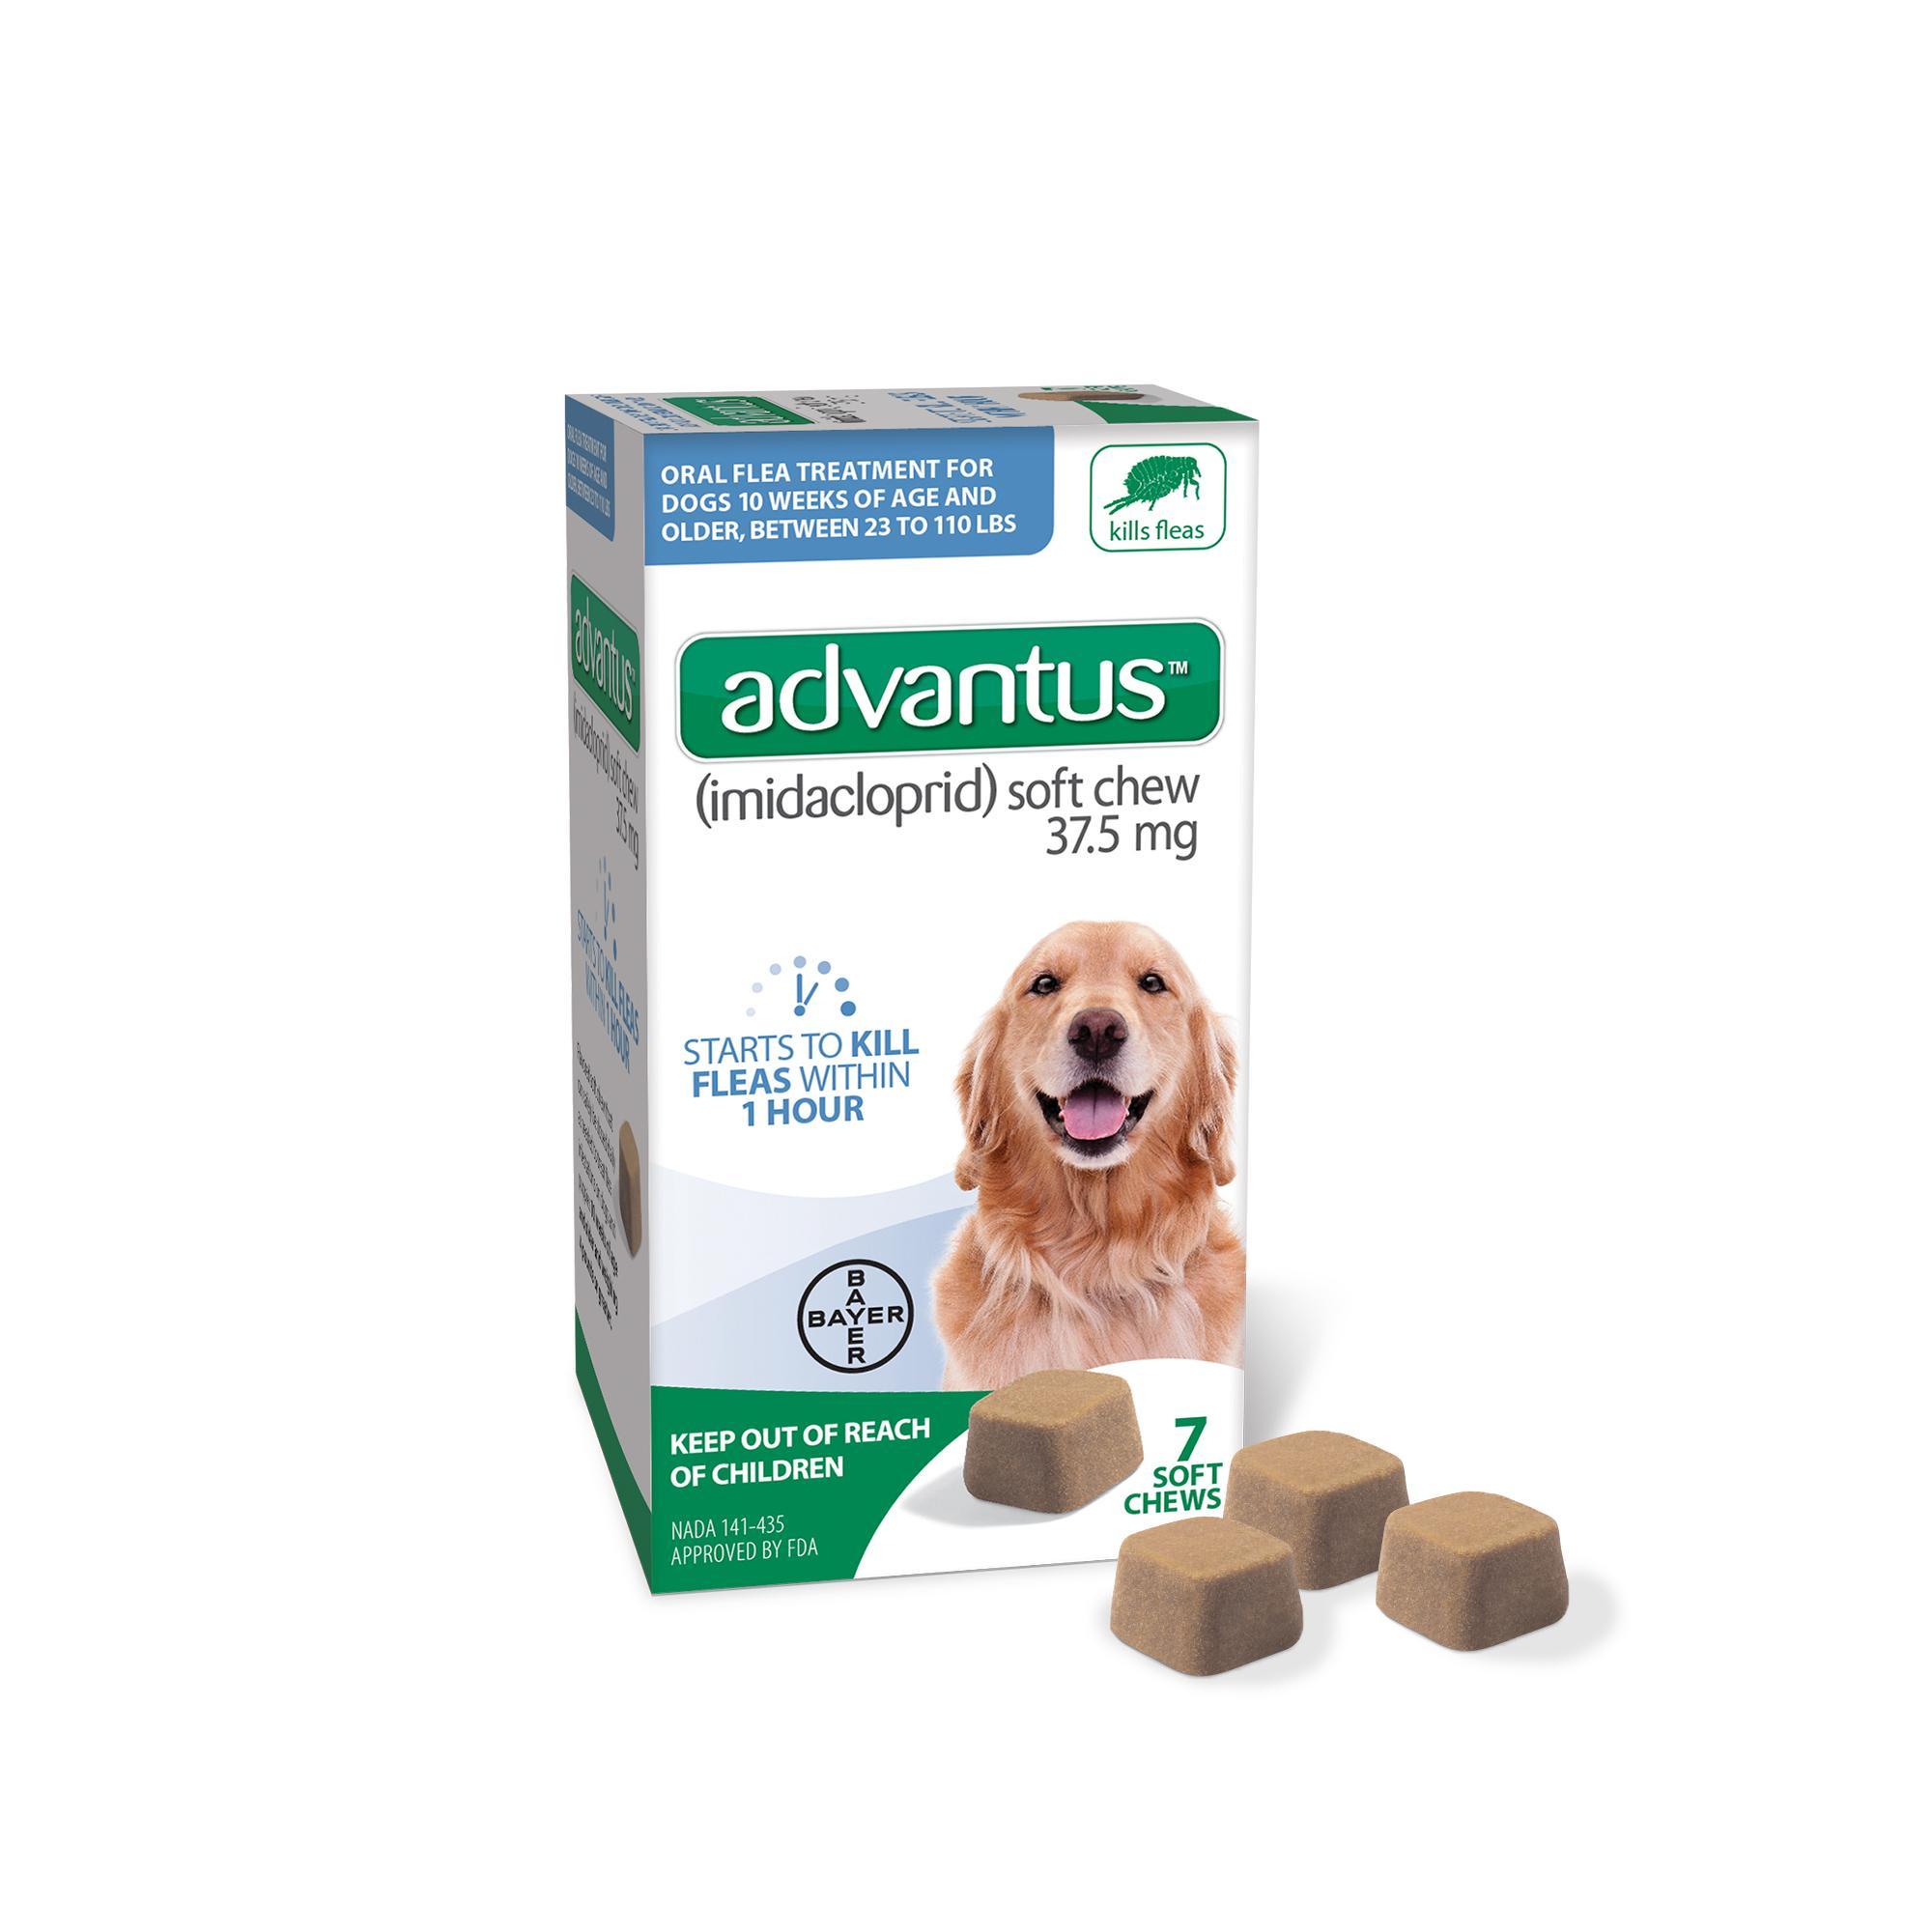 Advantus Large Dog Soft Chew Flea Treatment, 7-count